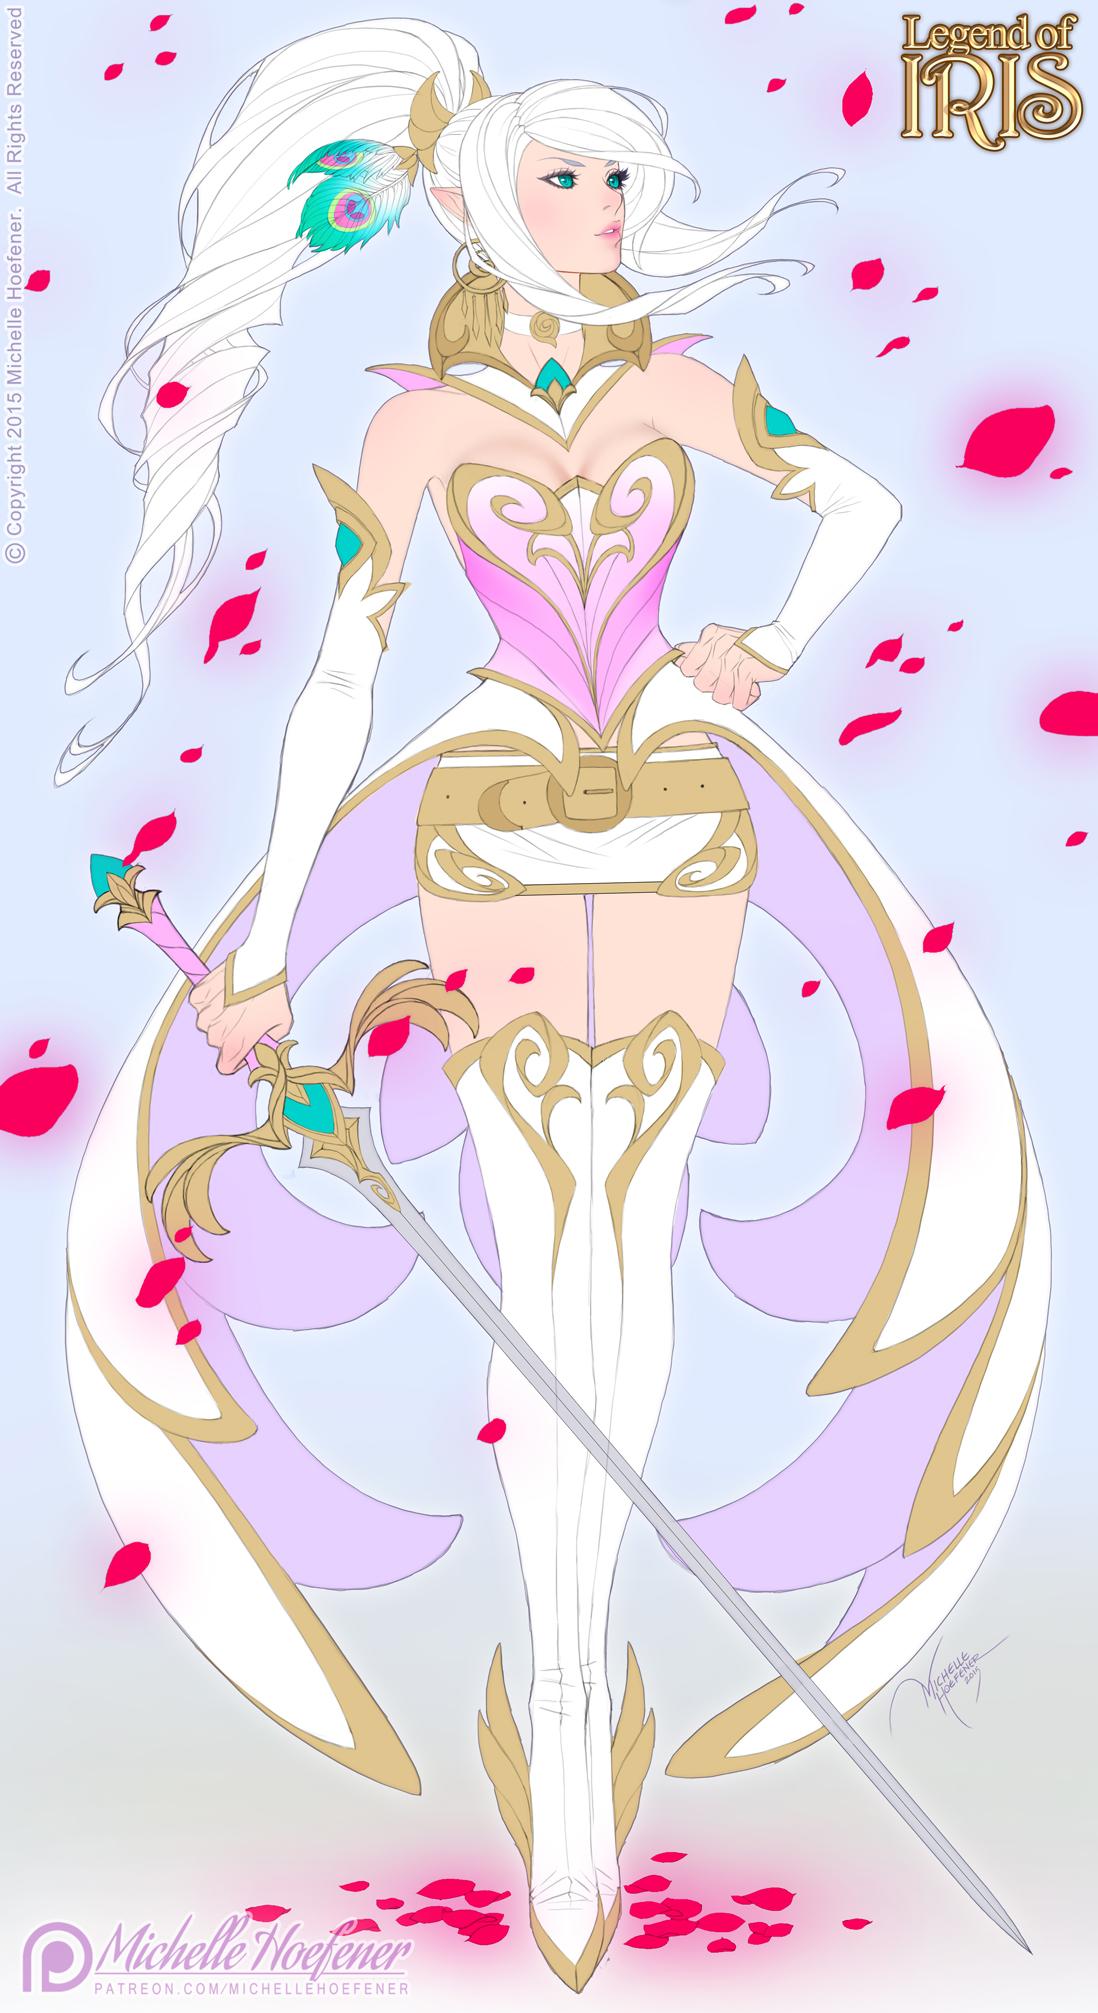 IRIS - Alternate Princess Dress - FLATS by MichelleHoefener